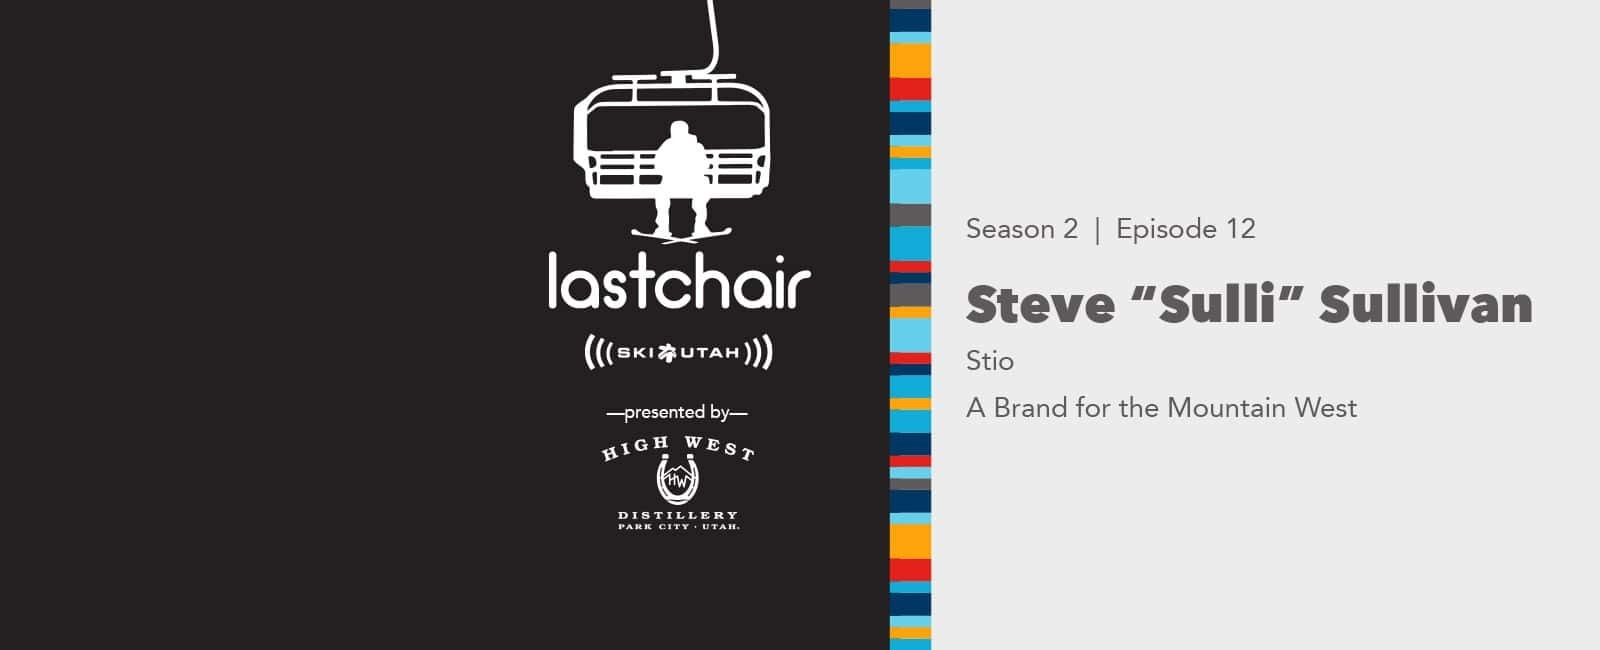 Steve Sullivan: Stio - A Brand for the Mountain West